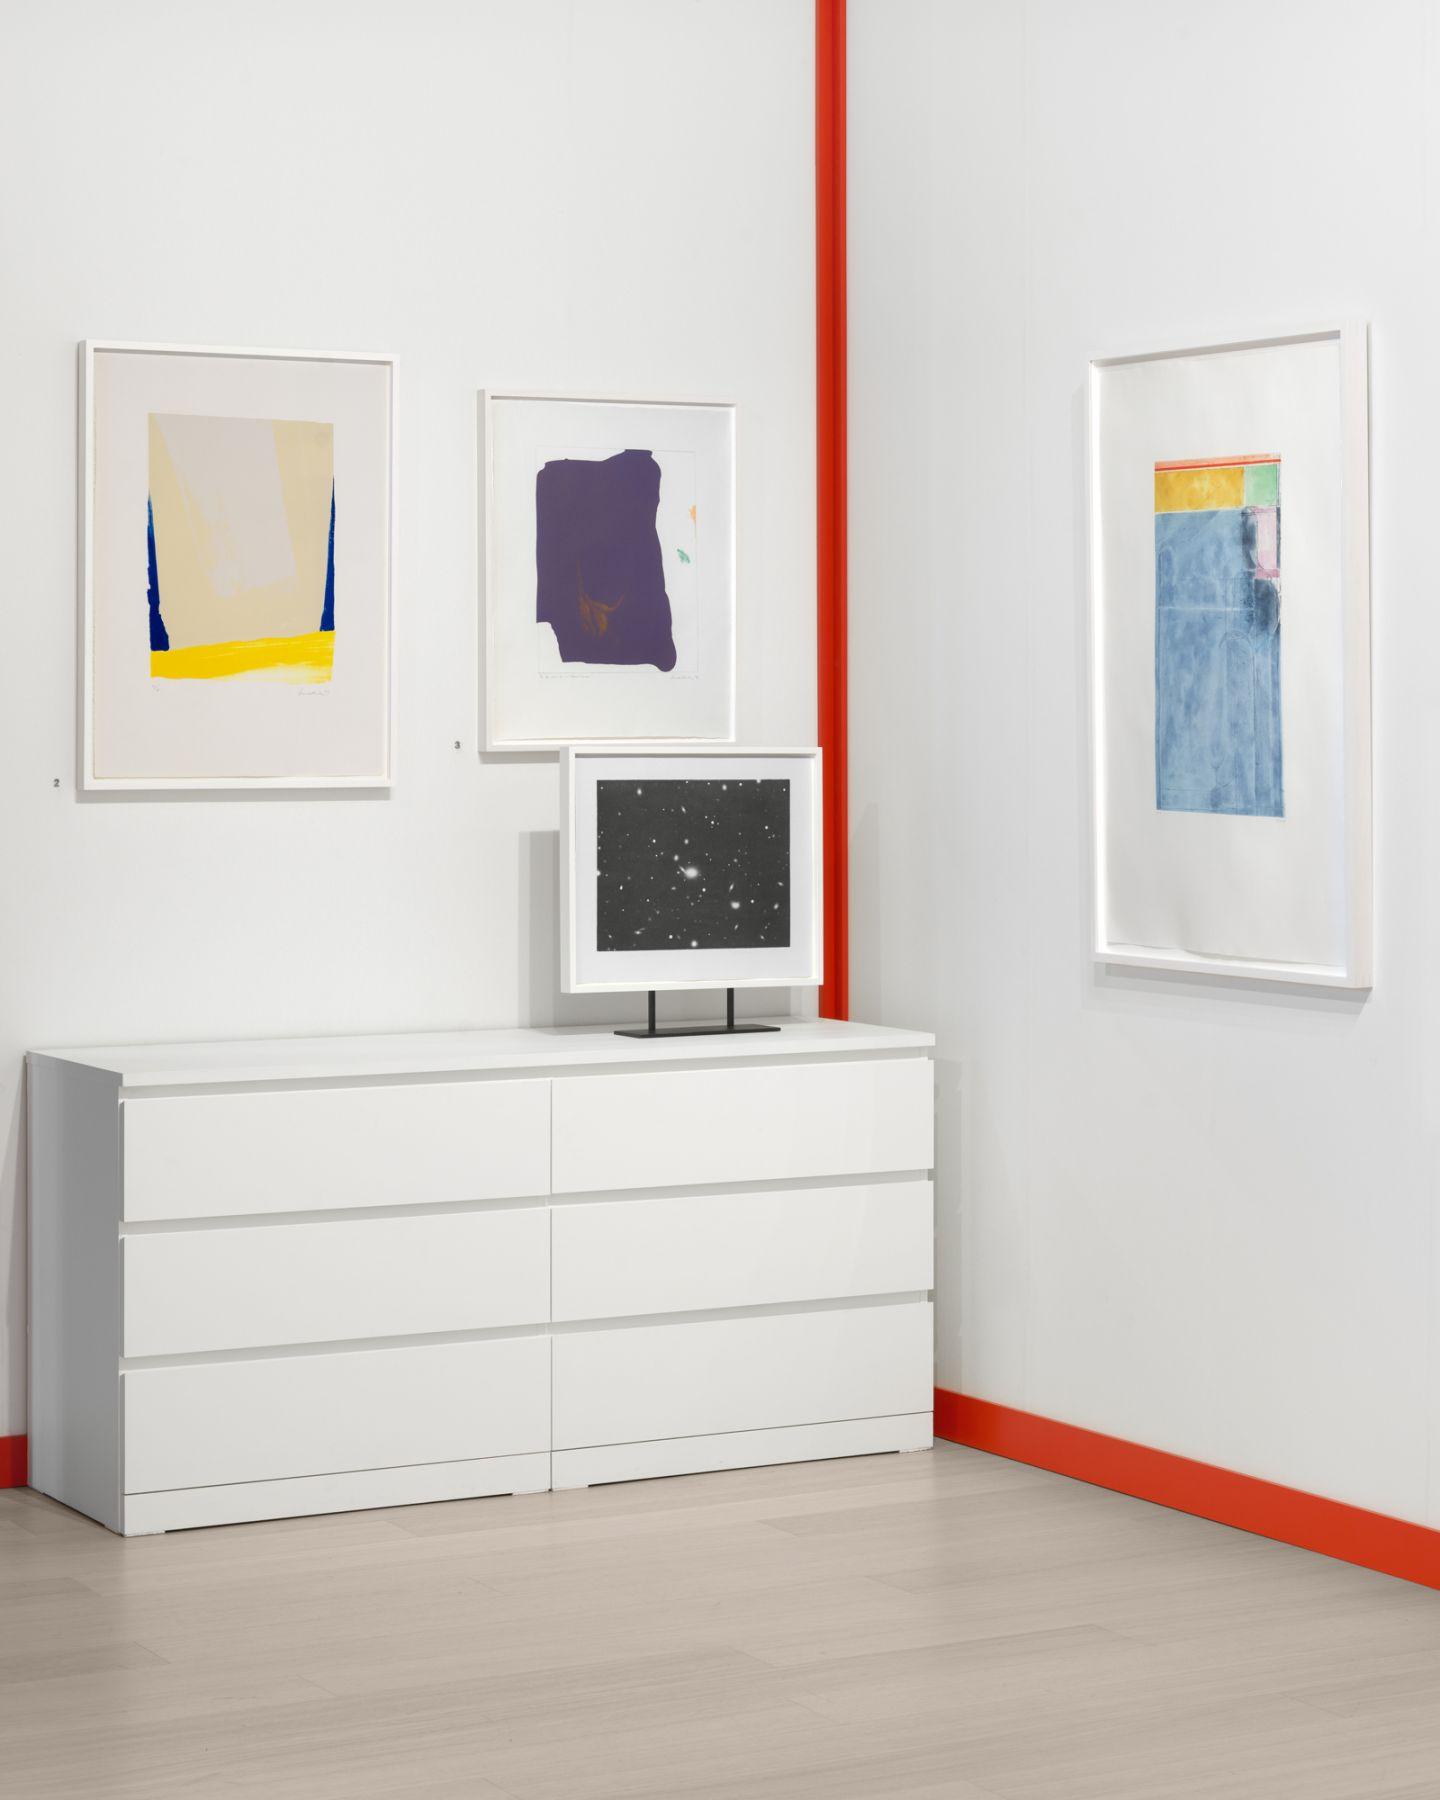 The ADAA Art Show 2020 at Susan Sheehan Gallery